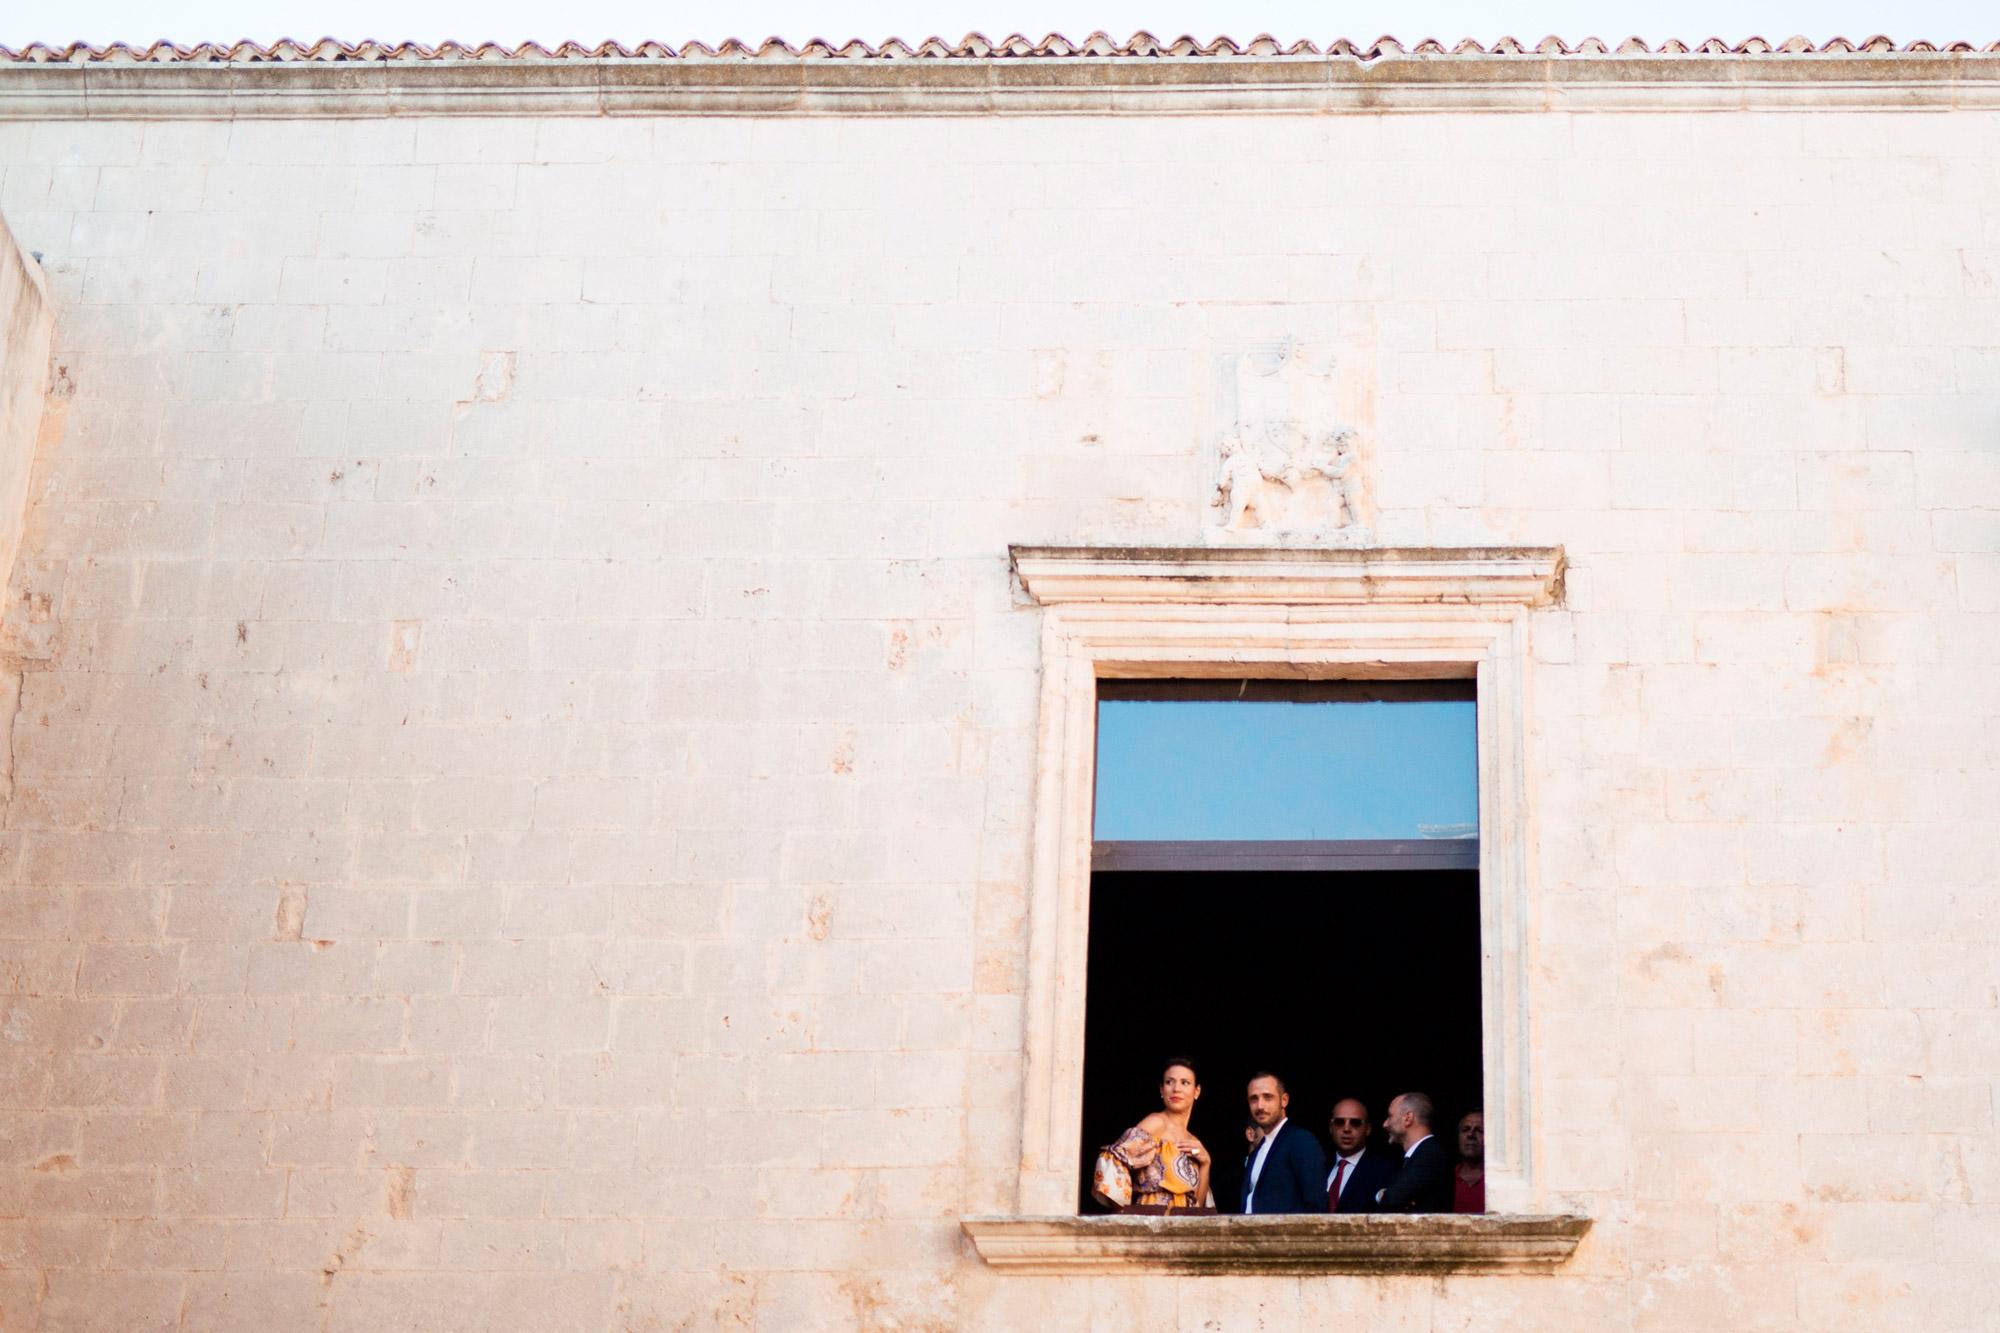 173-FIKUS-PUGLIA-wedding-ostuni-masseria.jpg